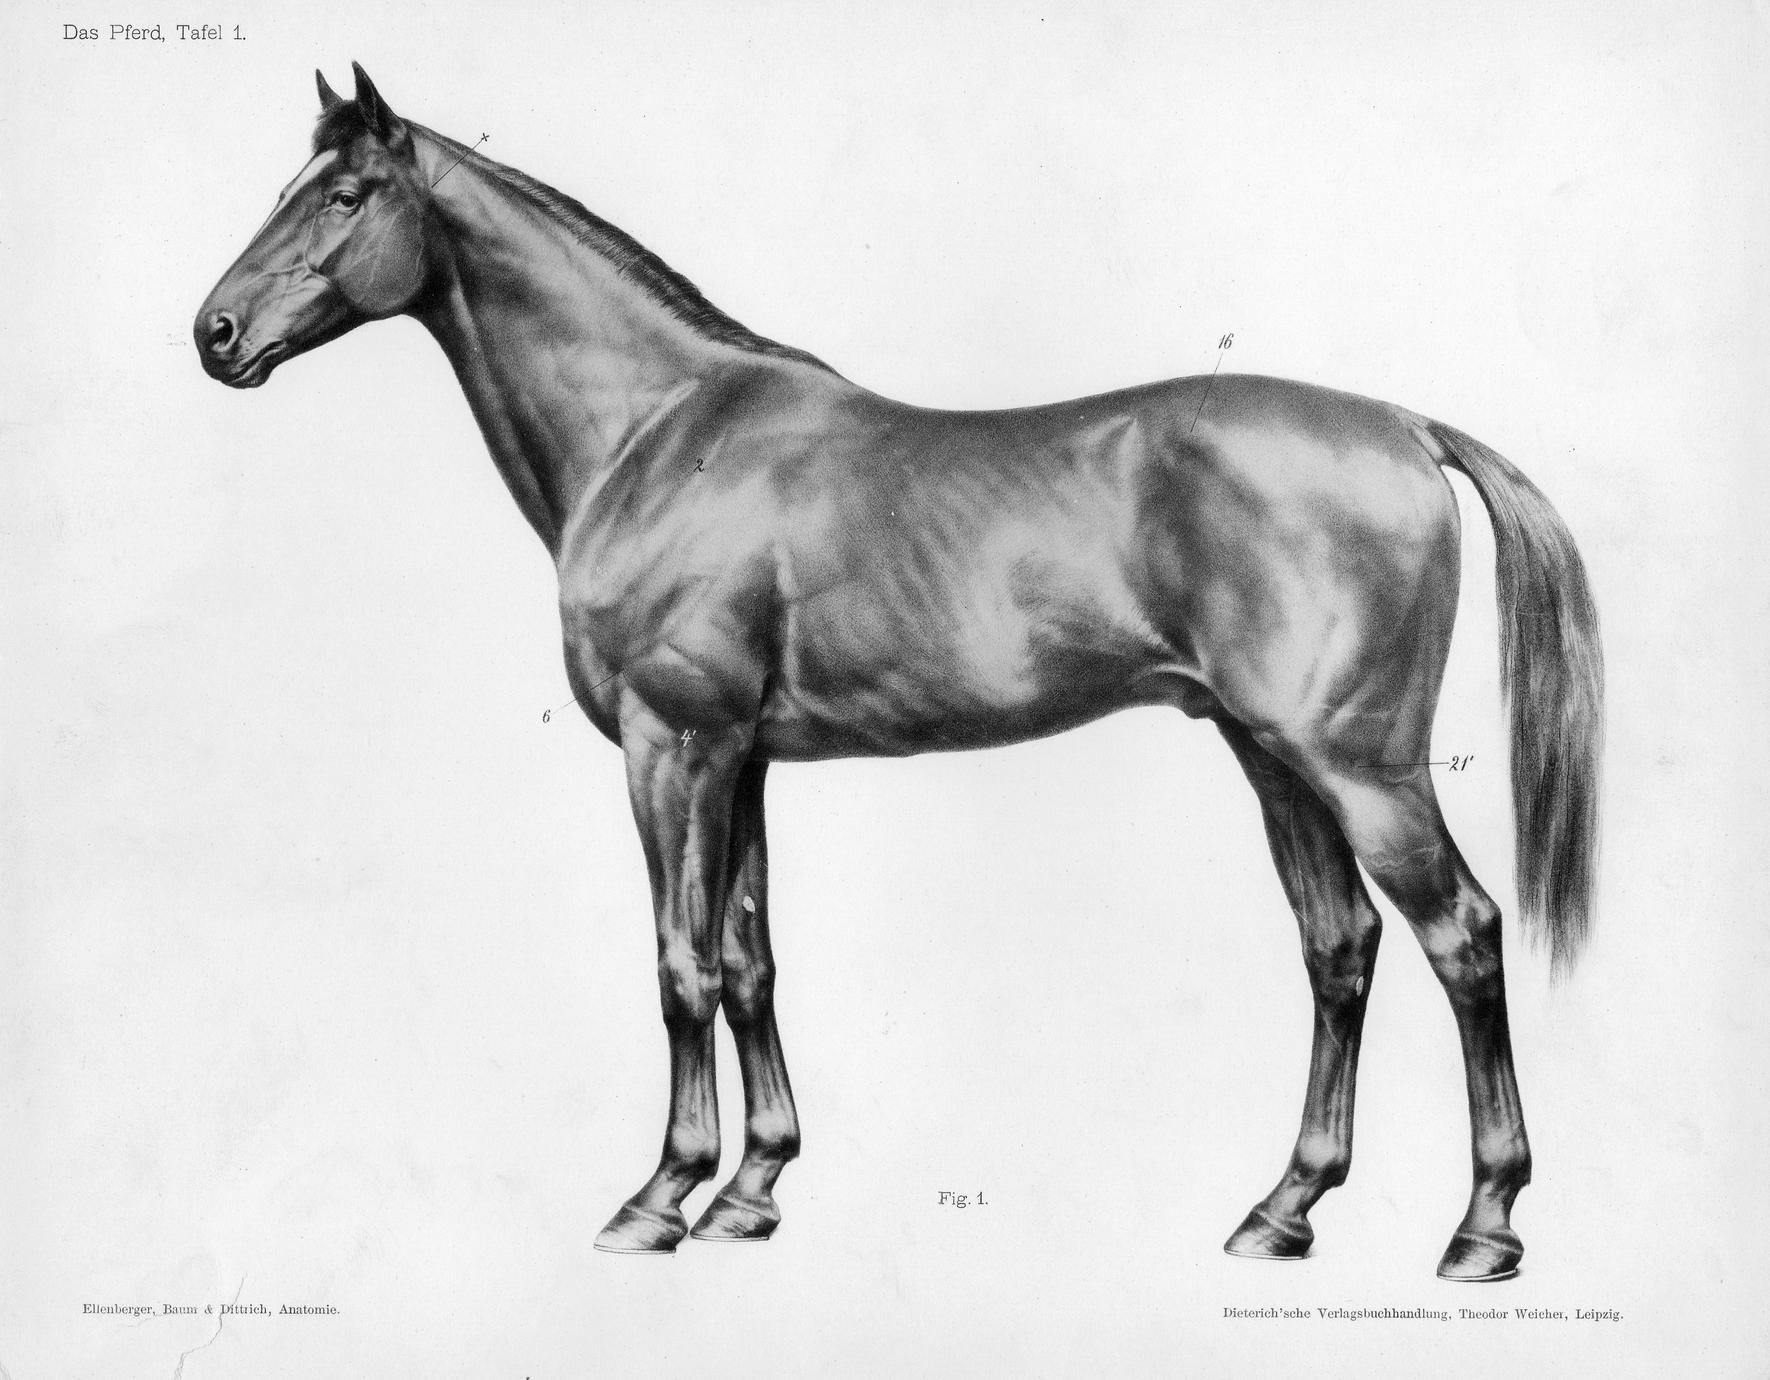 Das Pferd, Tafel 1